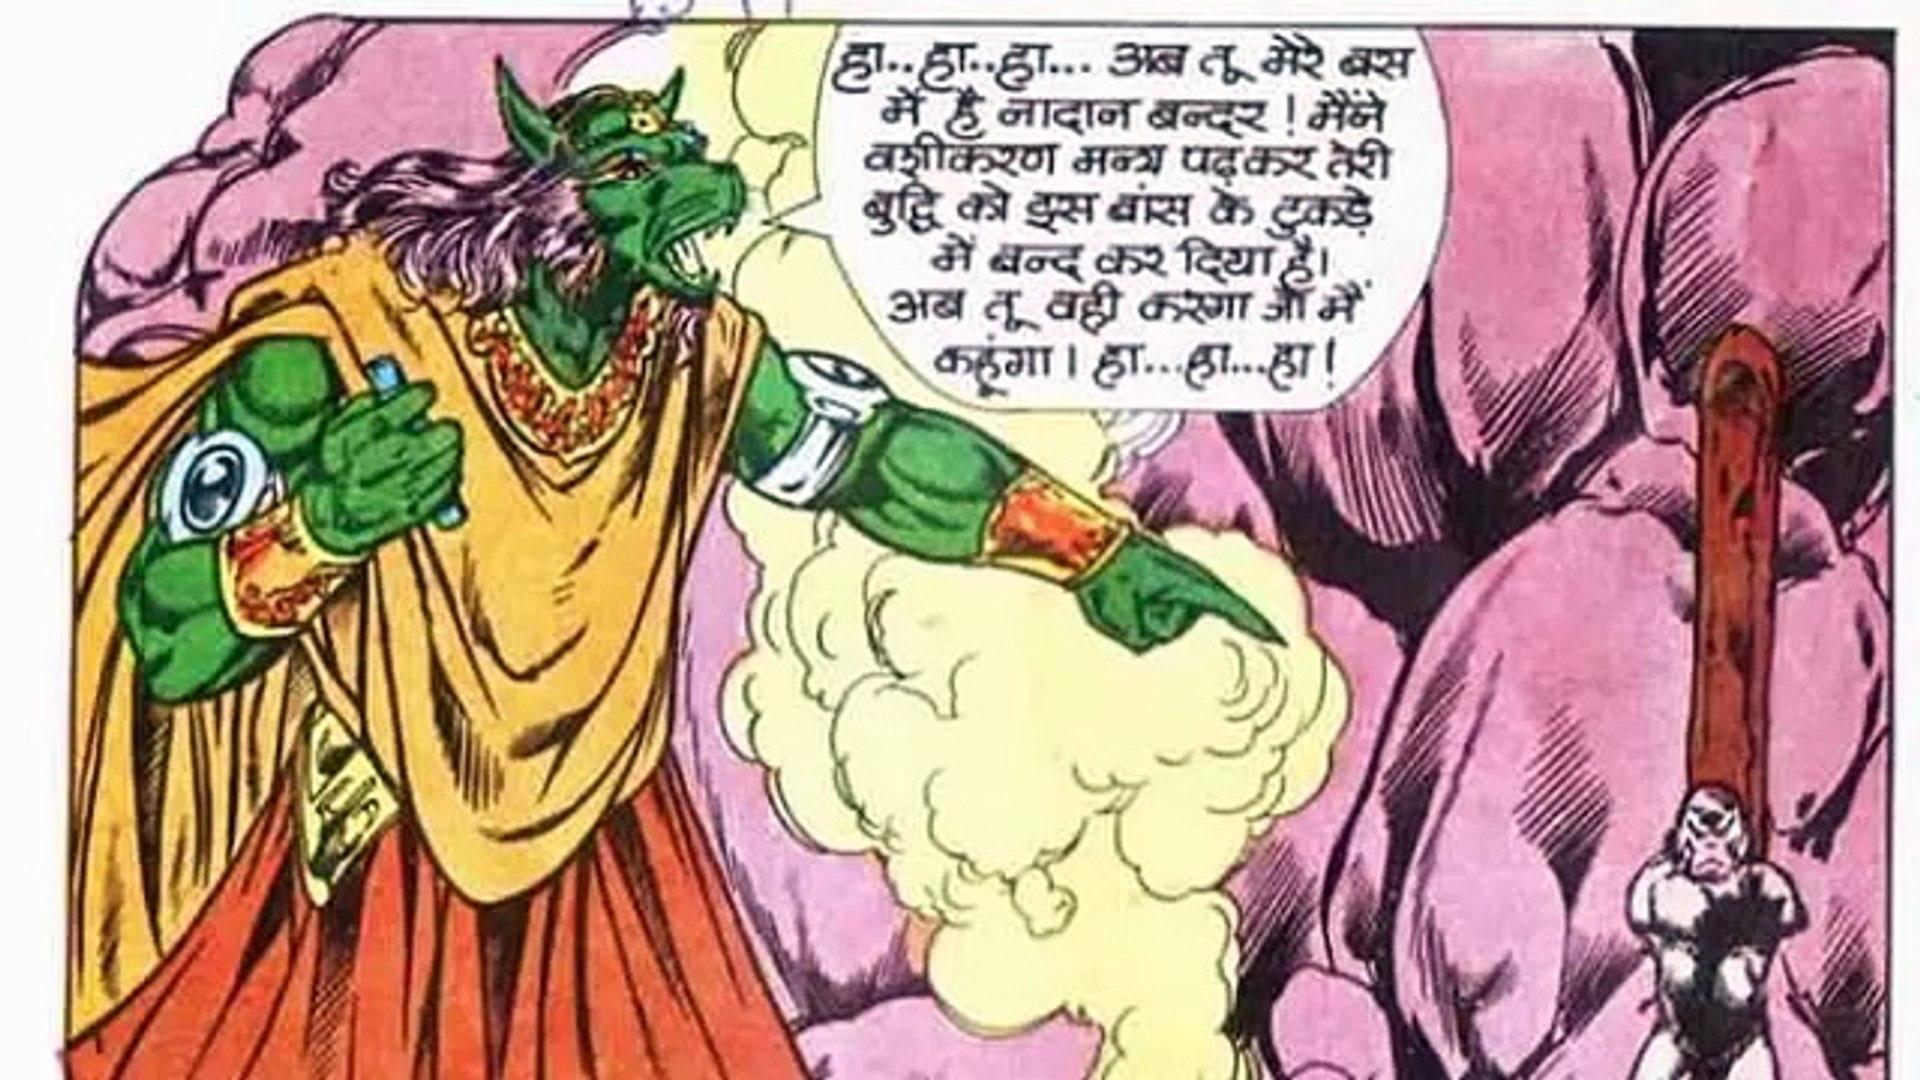 Top 5 Indian Comics Superheroes  Nagraj, Dhruv, Doga, Bheriya, and Parmanu  Raj Comics heroes